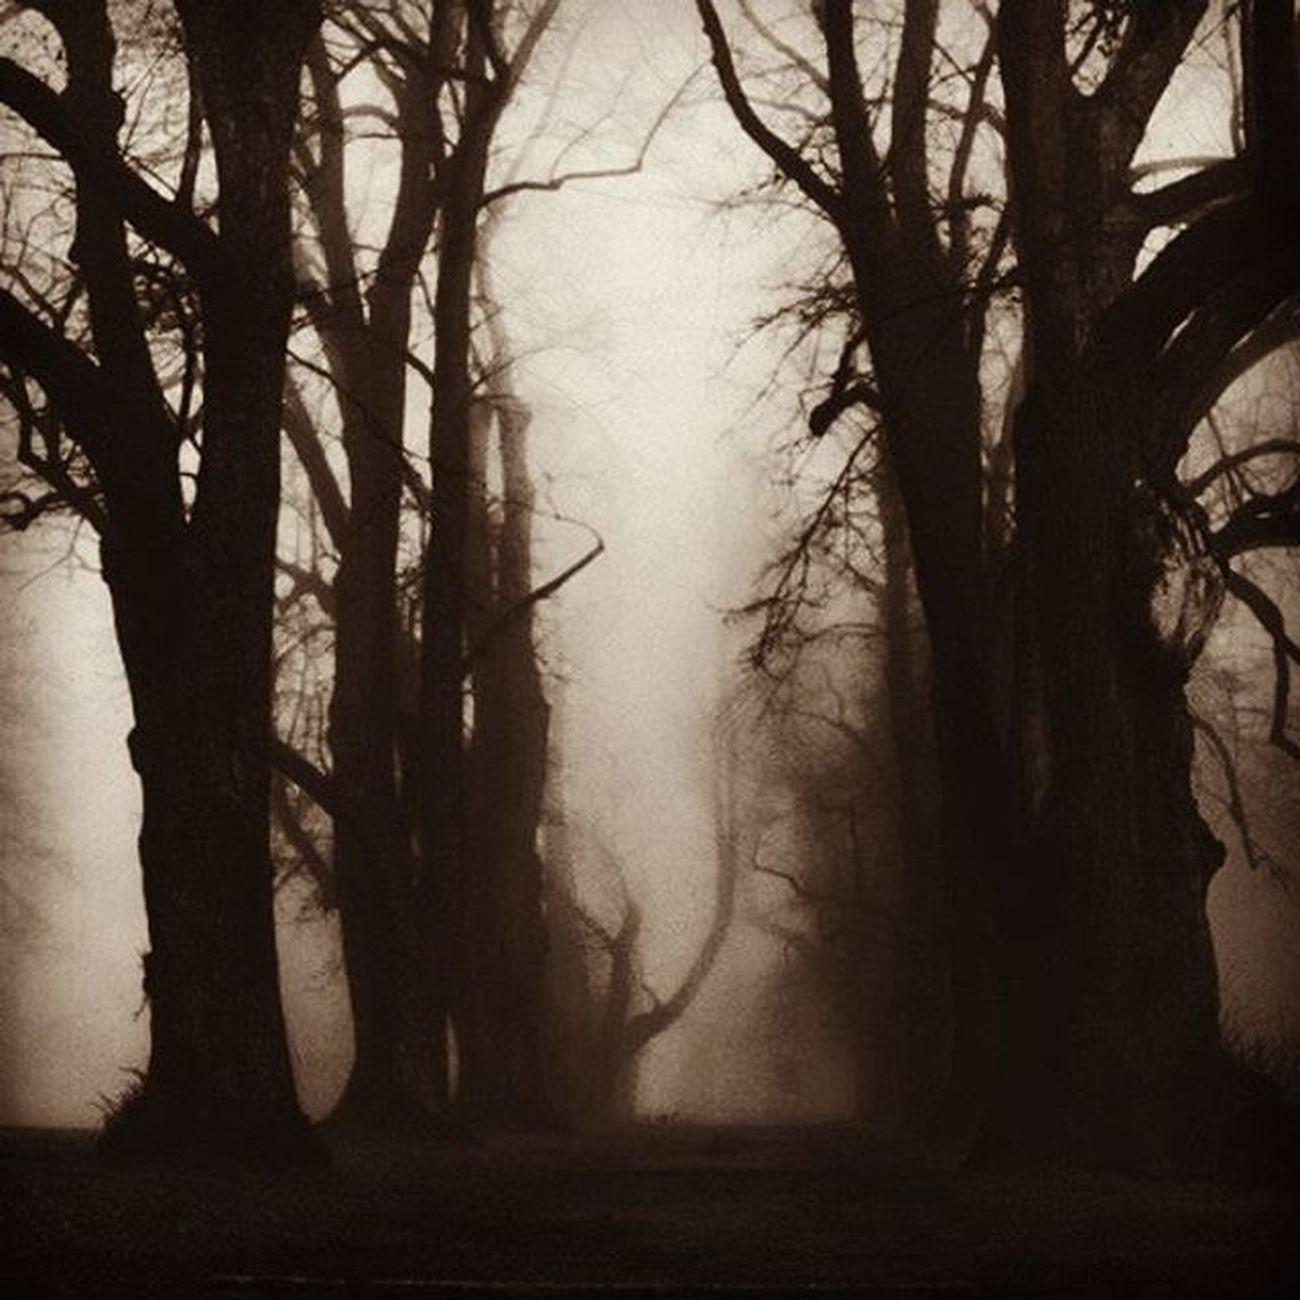 Abandoned Parapsikoloji Church Goth Mistic Match_bw Bw_lover Dark_nature Best_bnw_archive Bnw_captures Nature Naturelovers Insta_bw Pocket_bnw Srs_bnw Rsa_bnw Evil Likeforlike Ayad_bnw Moonlight Wood Darkness Darkwood Night Goth trees nightmare